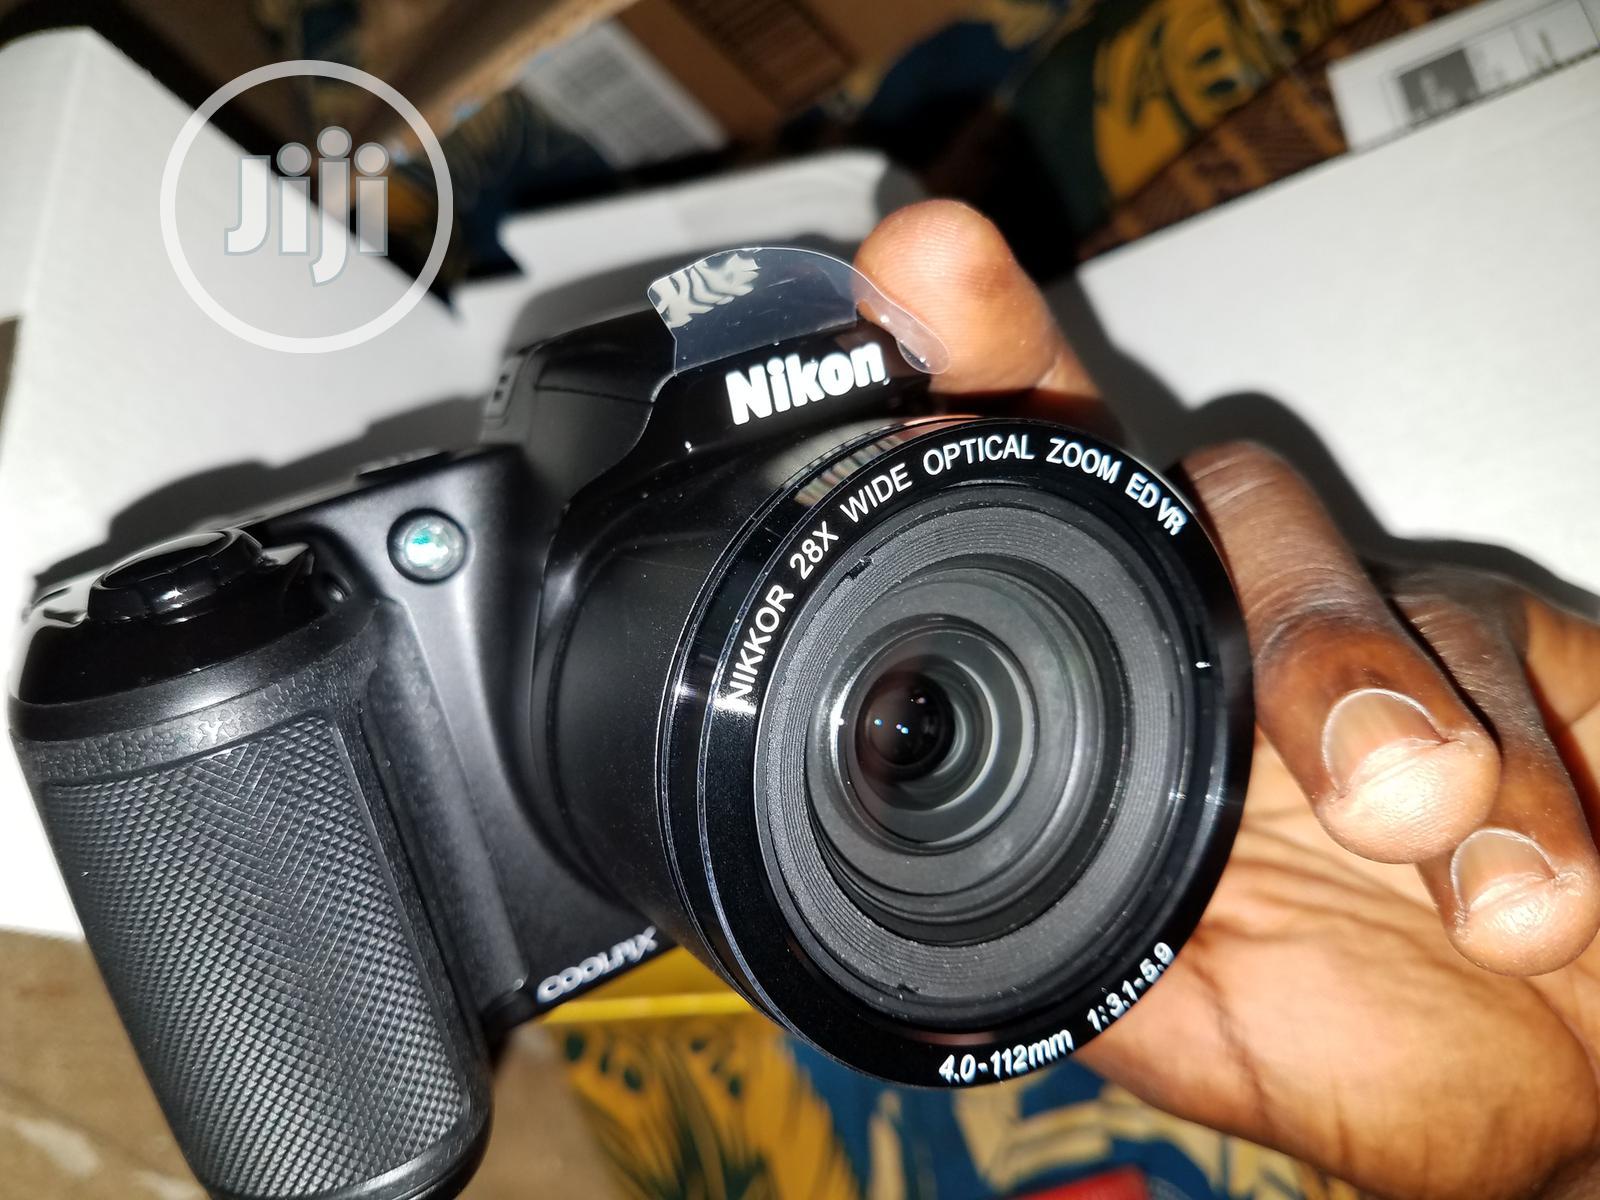 Archive: Digital Camera Nikon L340 To Be Precise